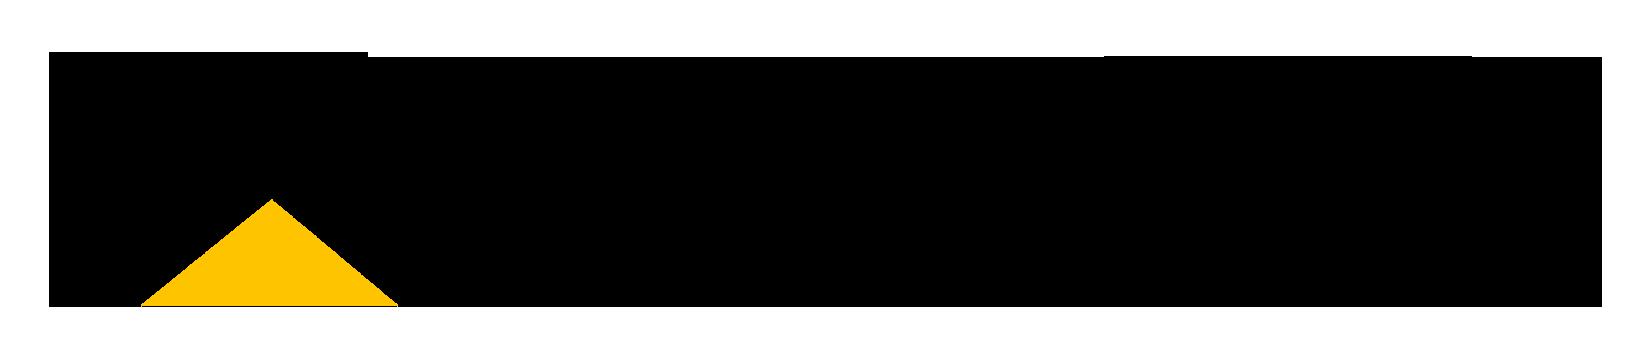 Caterpillar Dynamometer